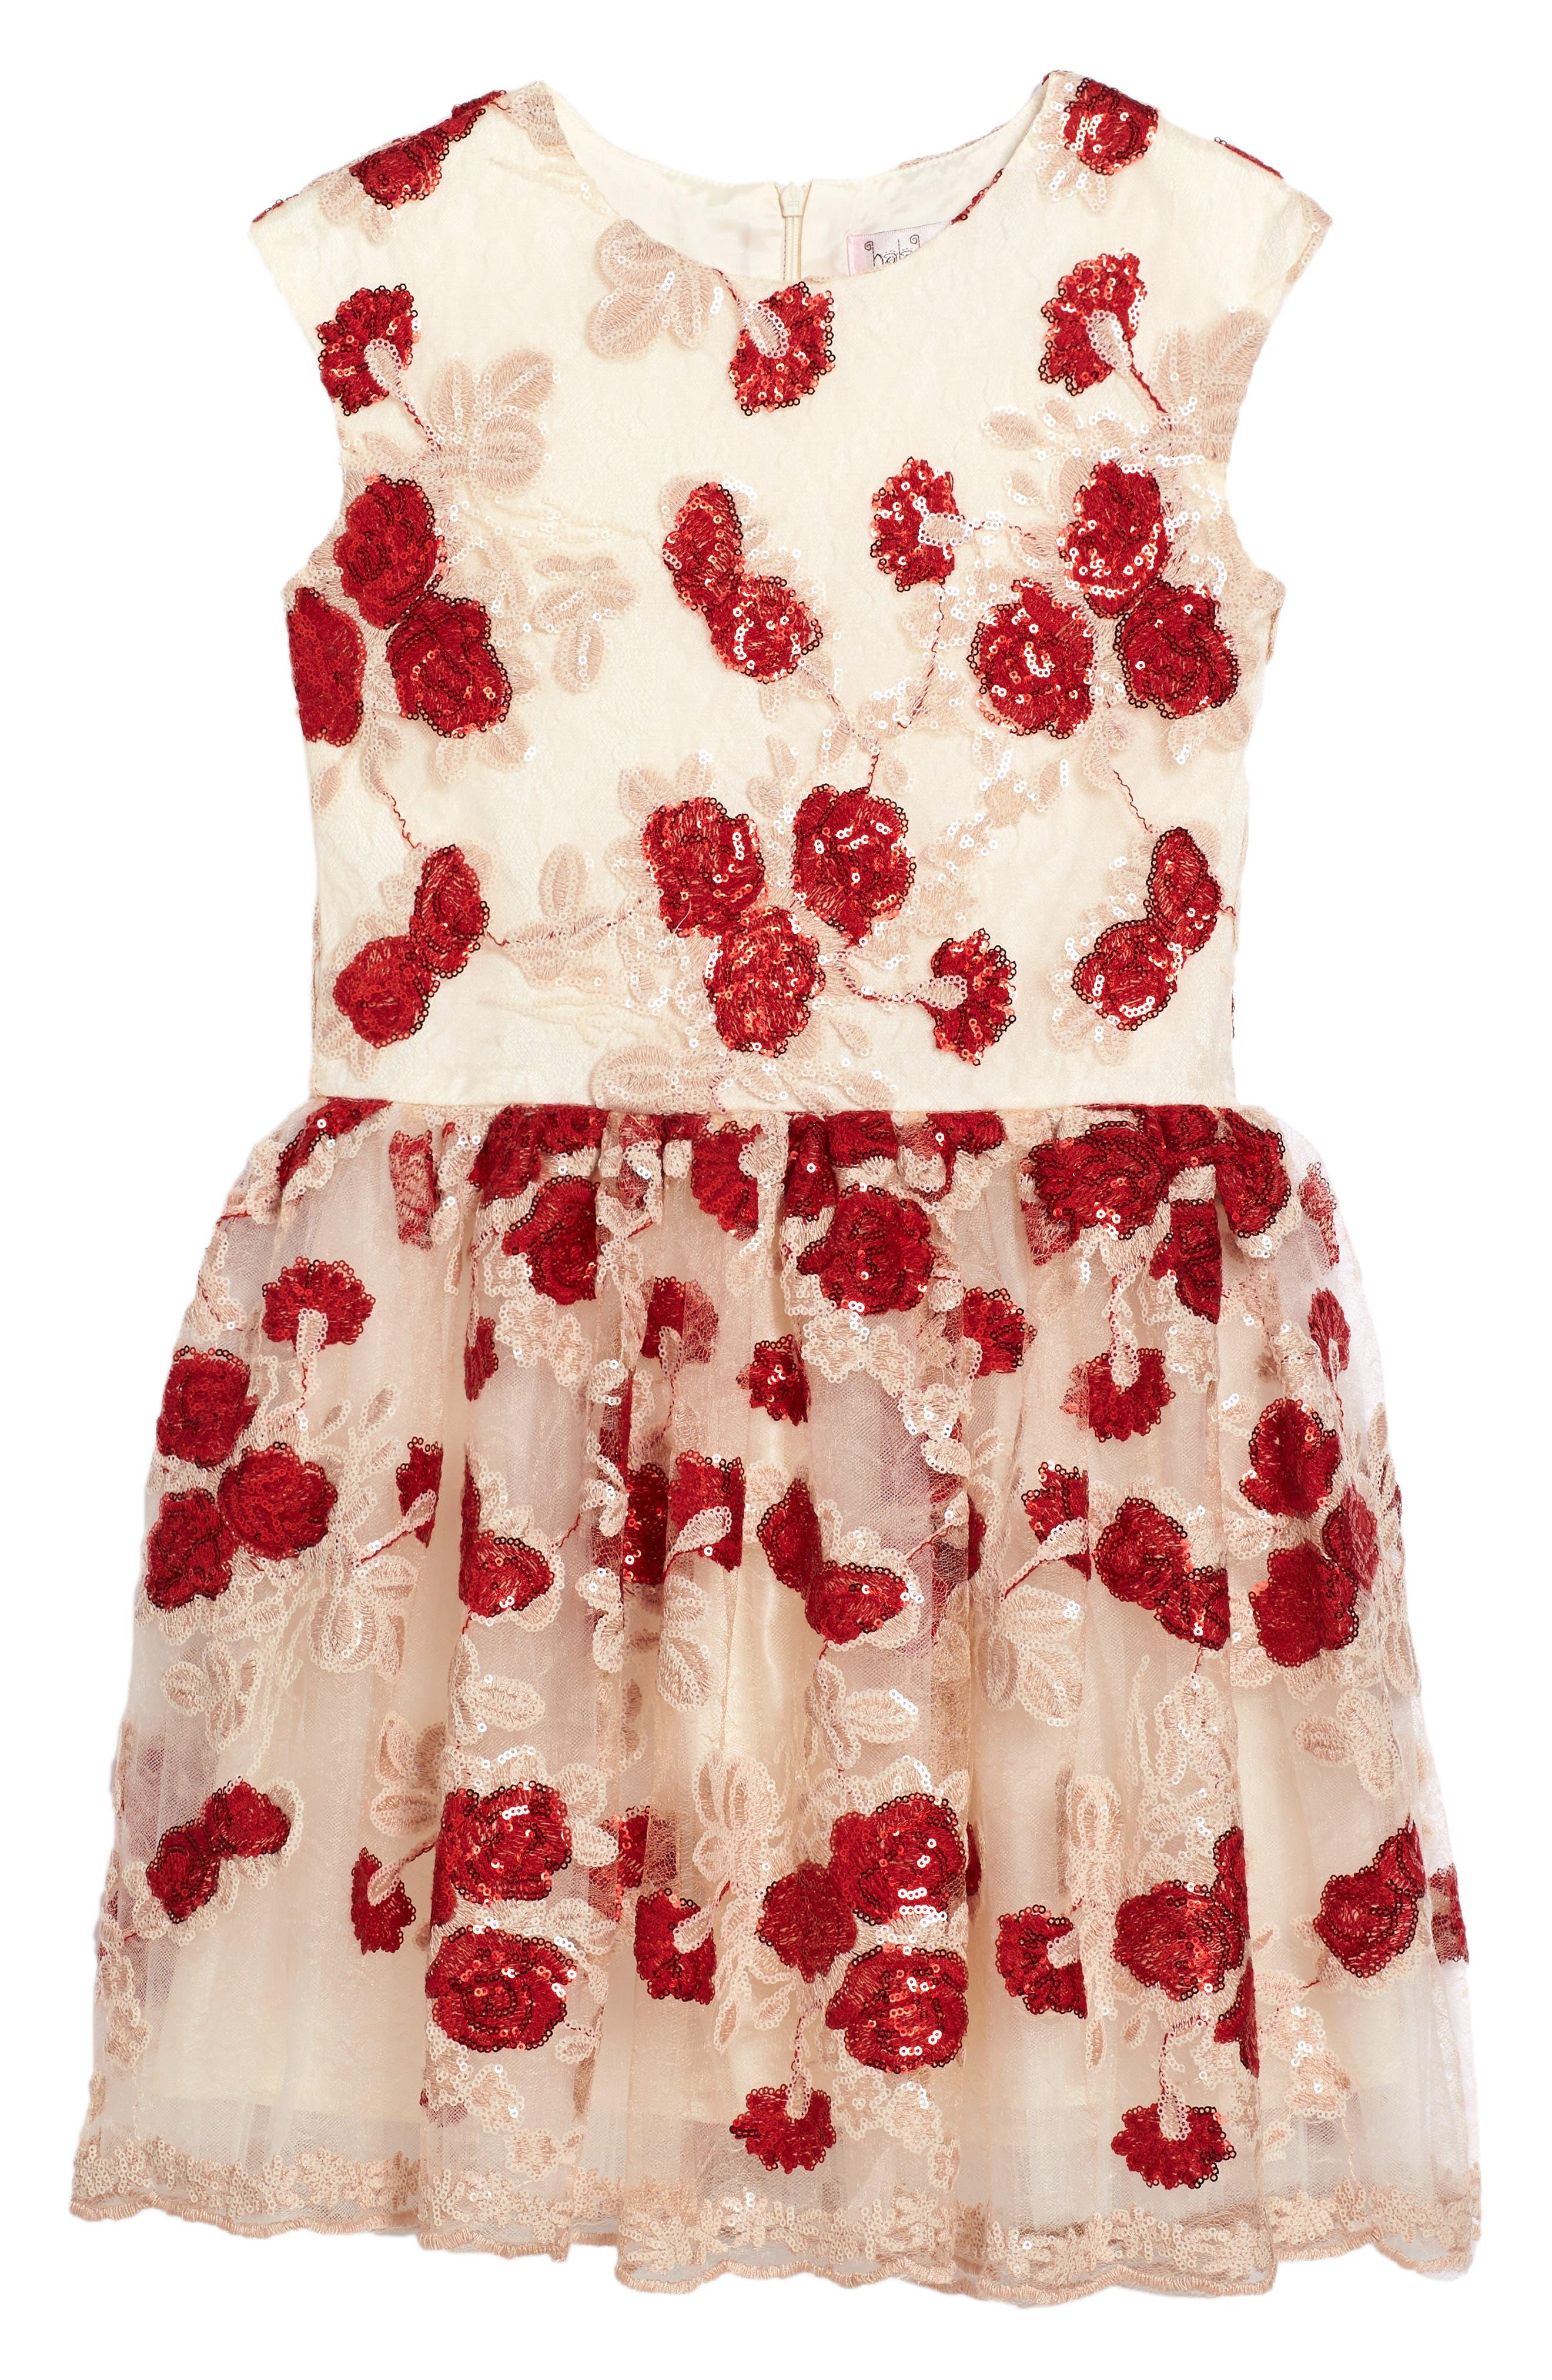 Main Image - Halabaloo Floral Sequin Mesh Dress (Toddler Girls, Little Girls & Big Girls)